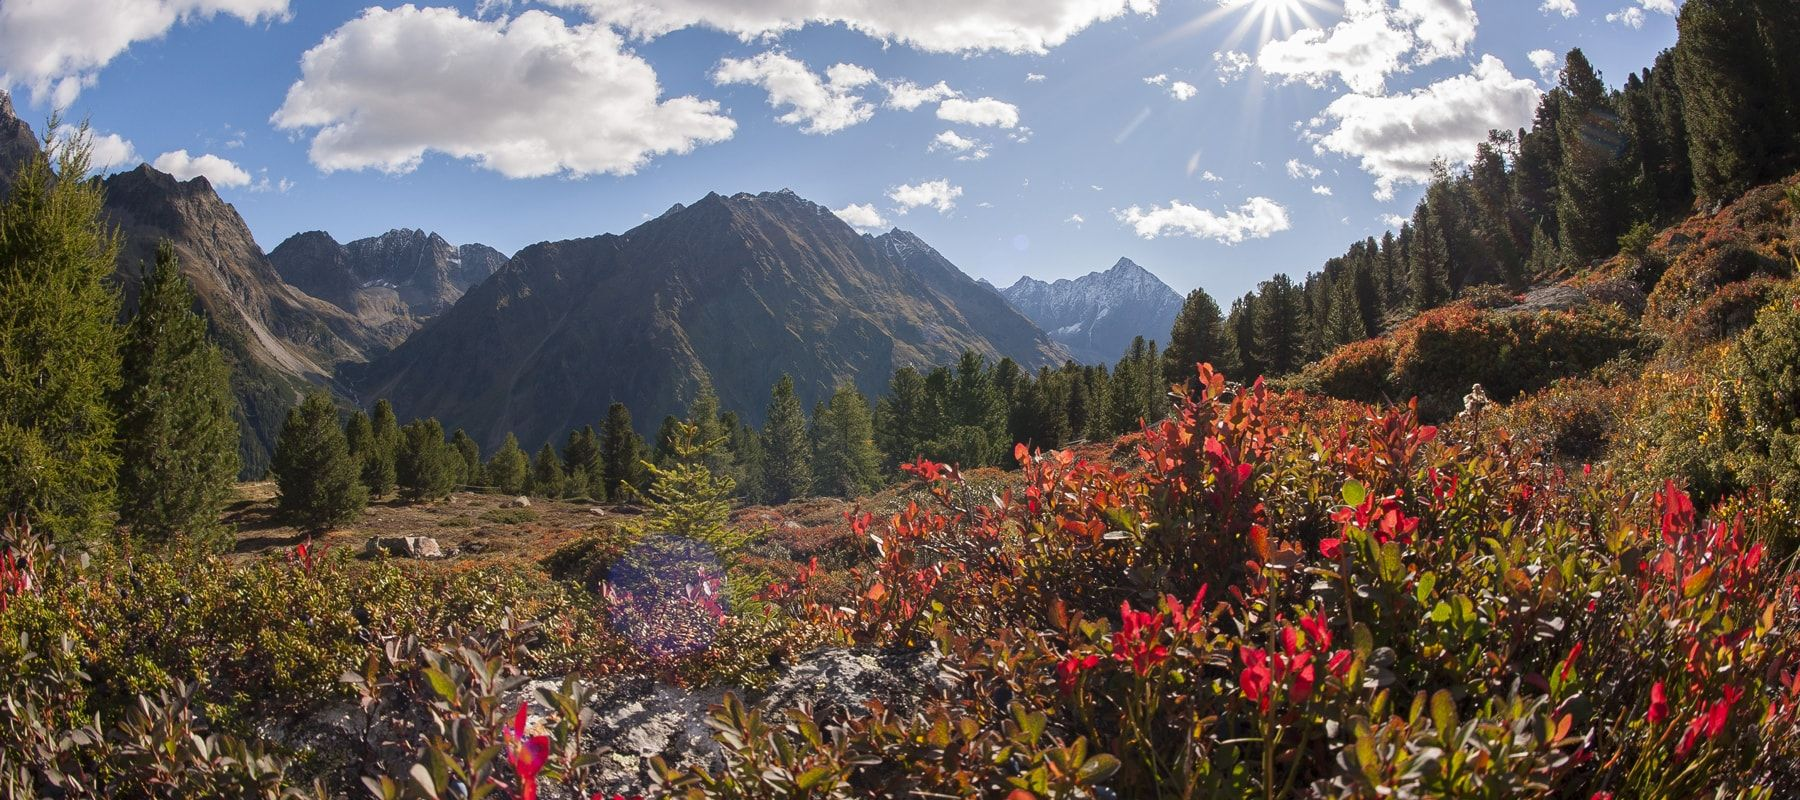 Sommerurlaub-Längenfeld-Ötztal